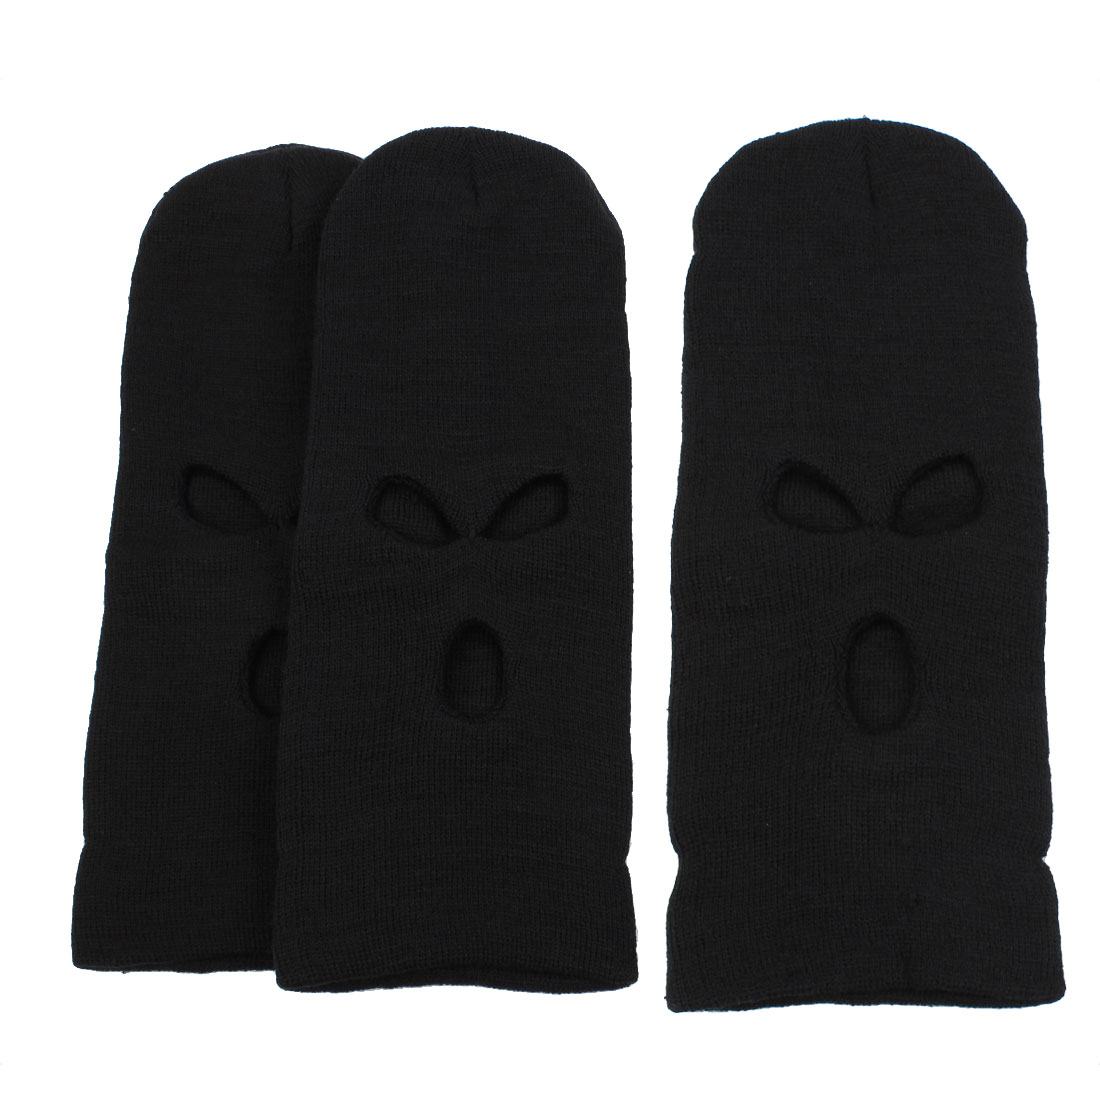 Winter Sports Cover Neck Scarf Full Face Mask Hood Cap Balaclava Hat Black 3PCS